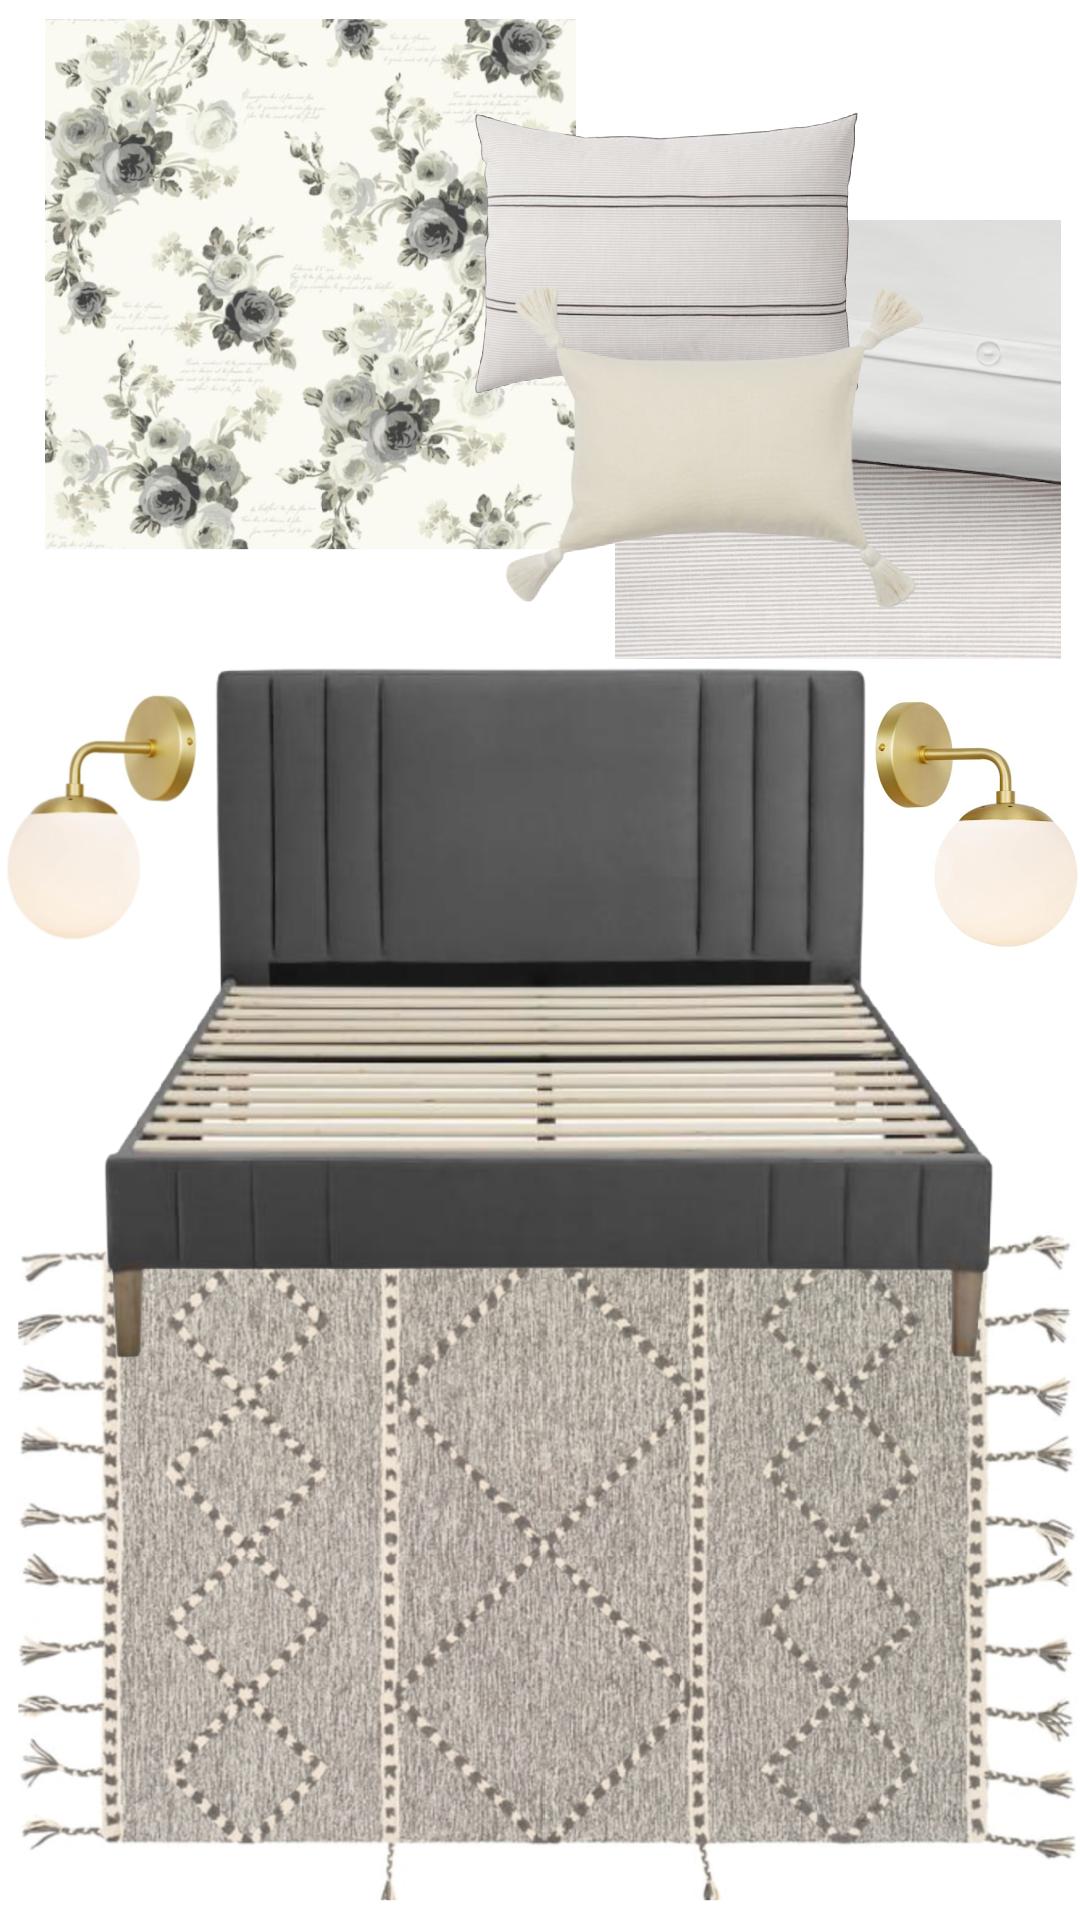 Small master bedroom ideas- peel and stick wallpaper bedroom